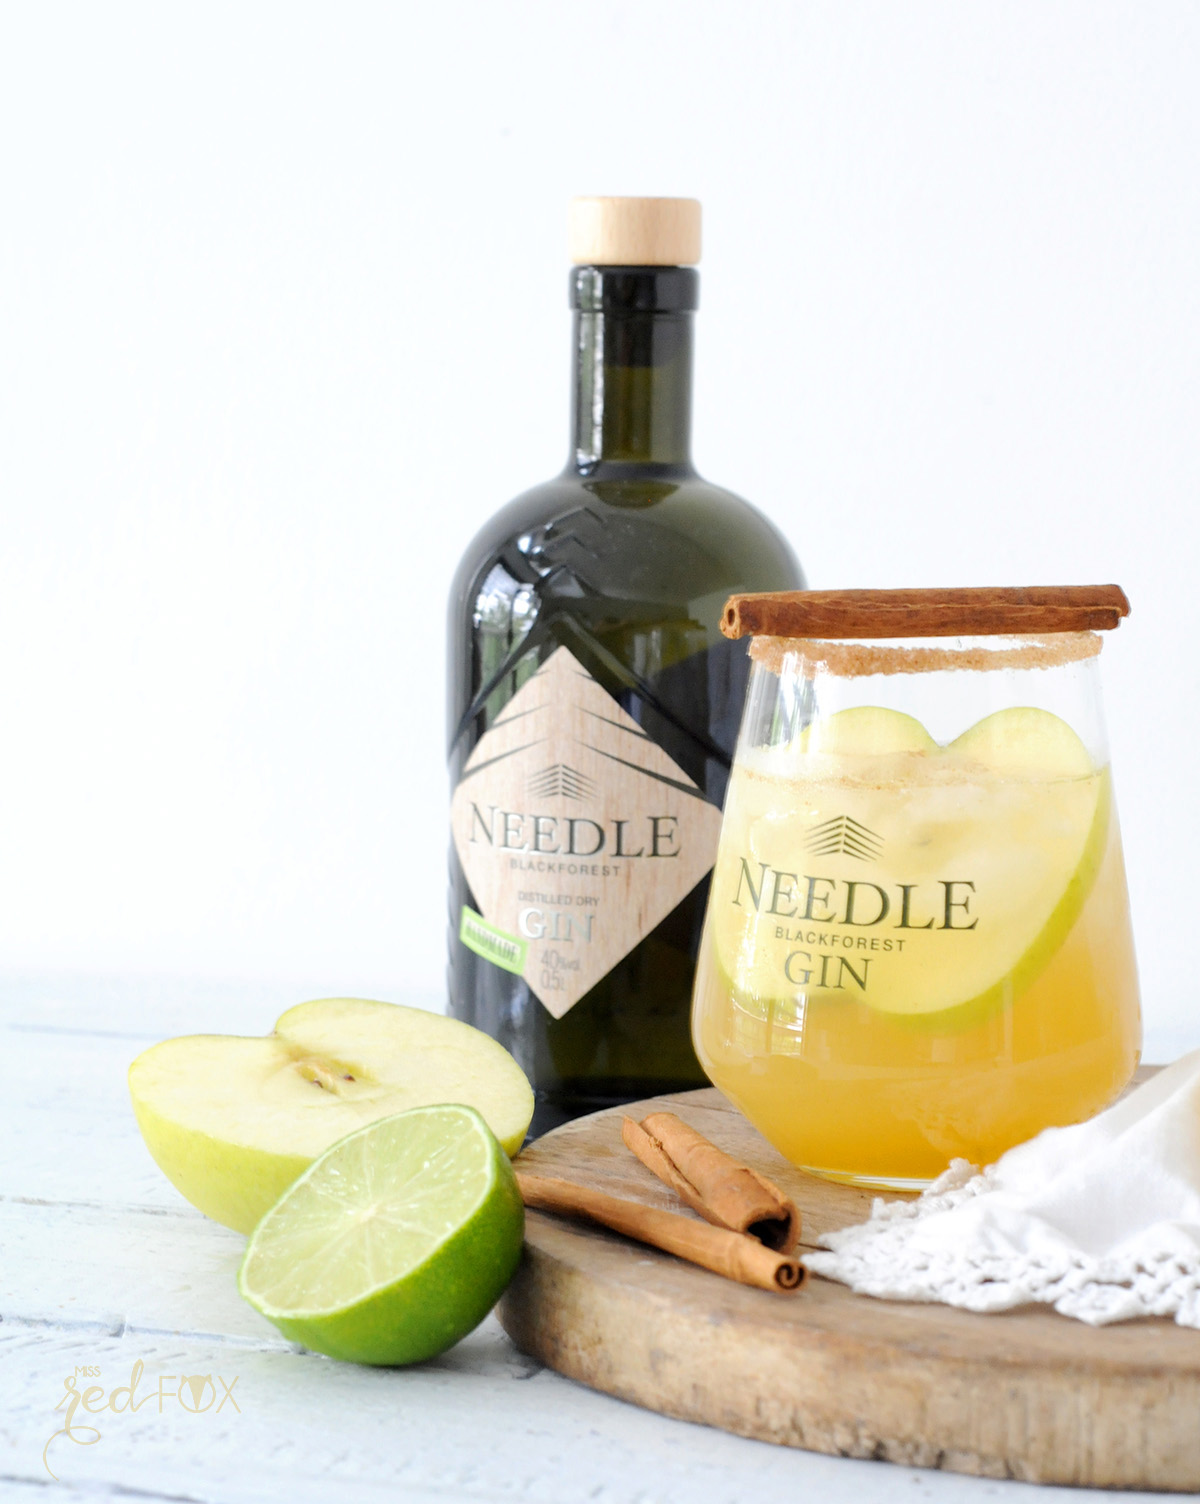 missredfox - Needle Gin - Cocktail mit Apfel Honig Zimt - 03